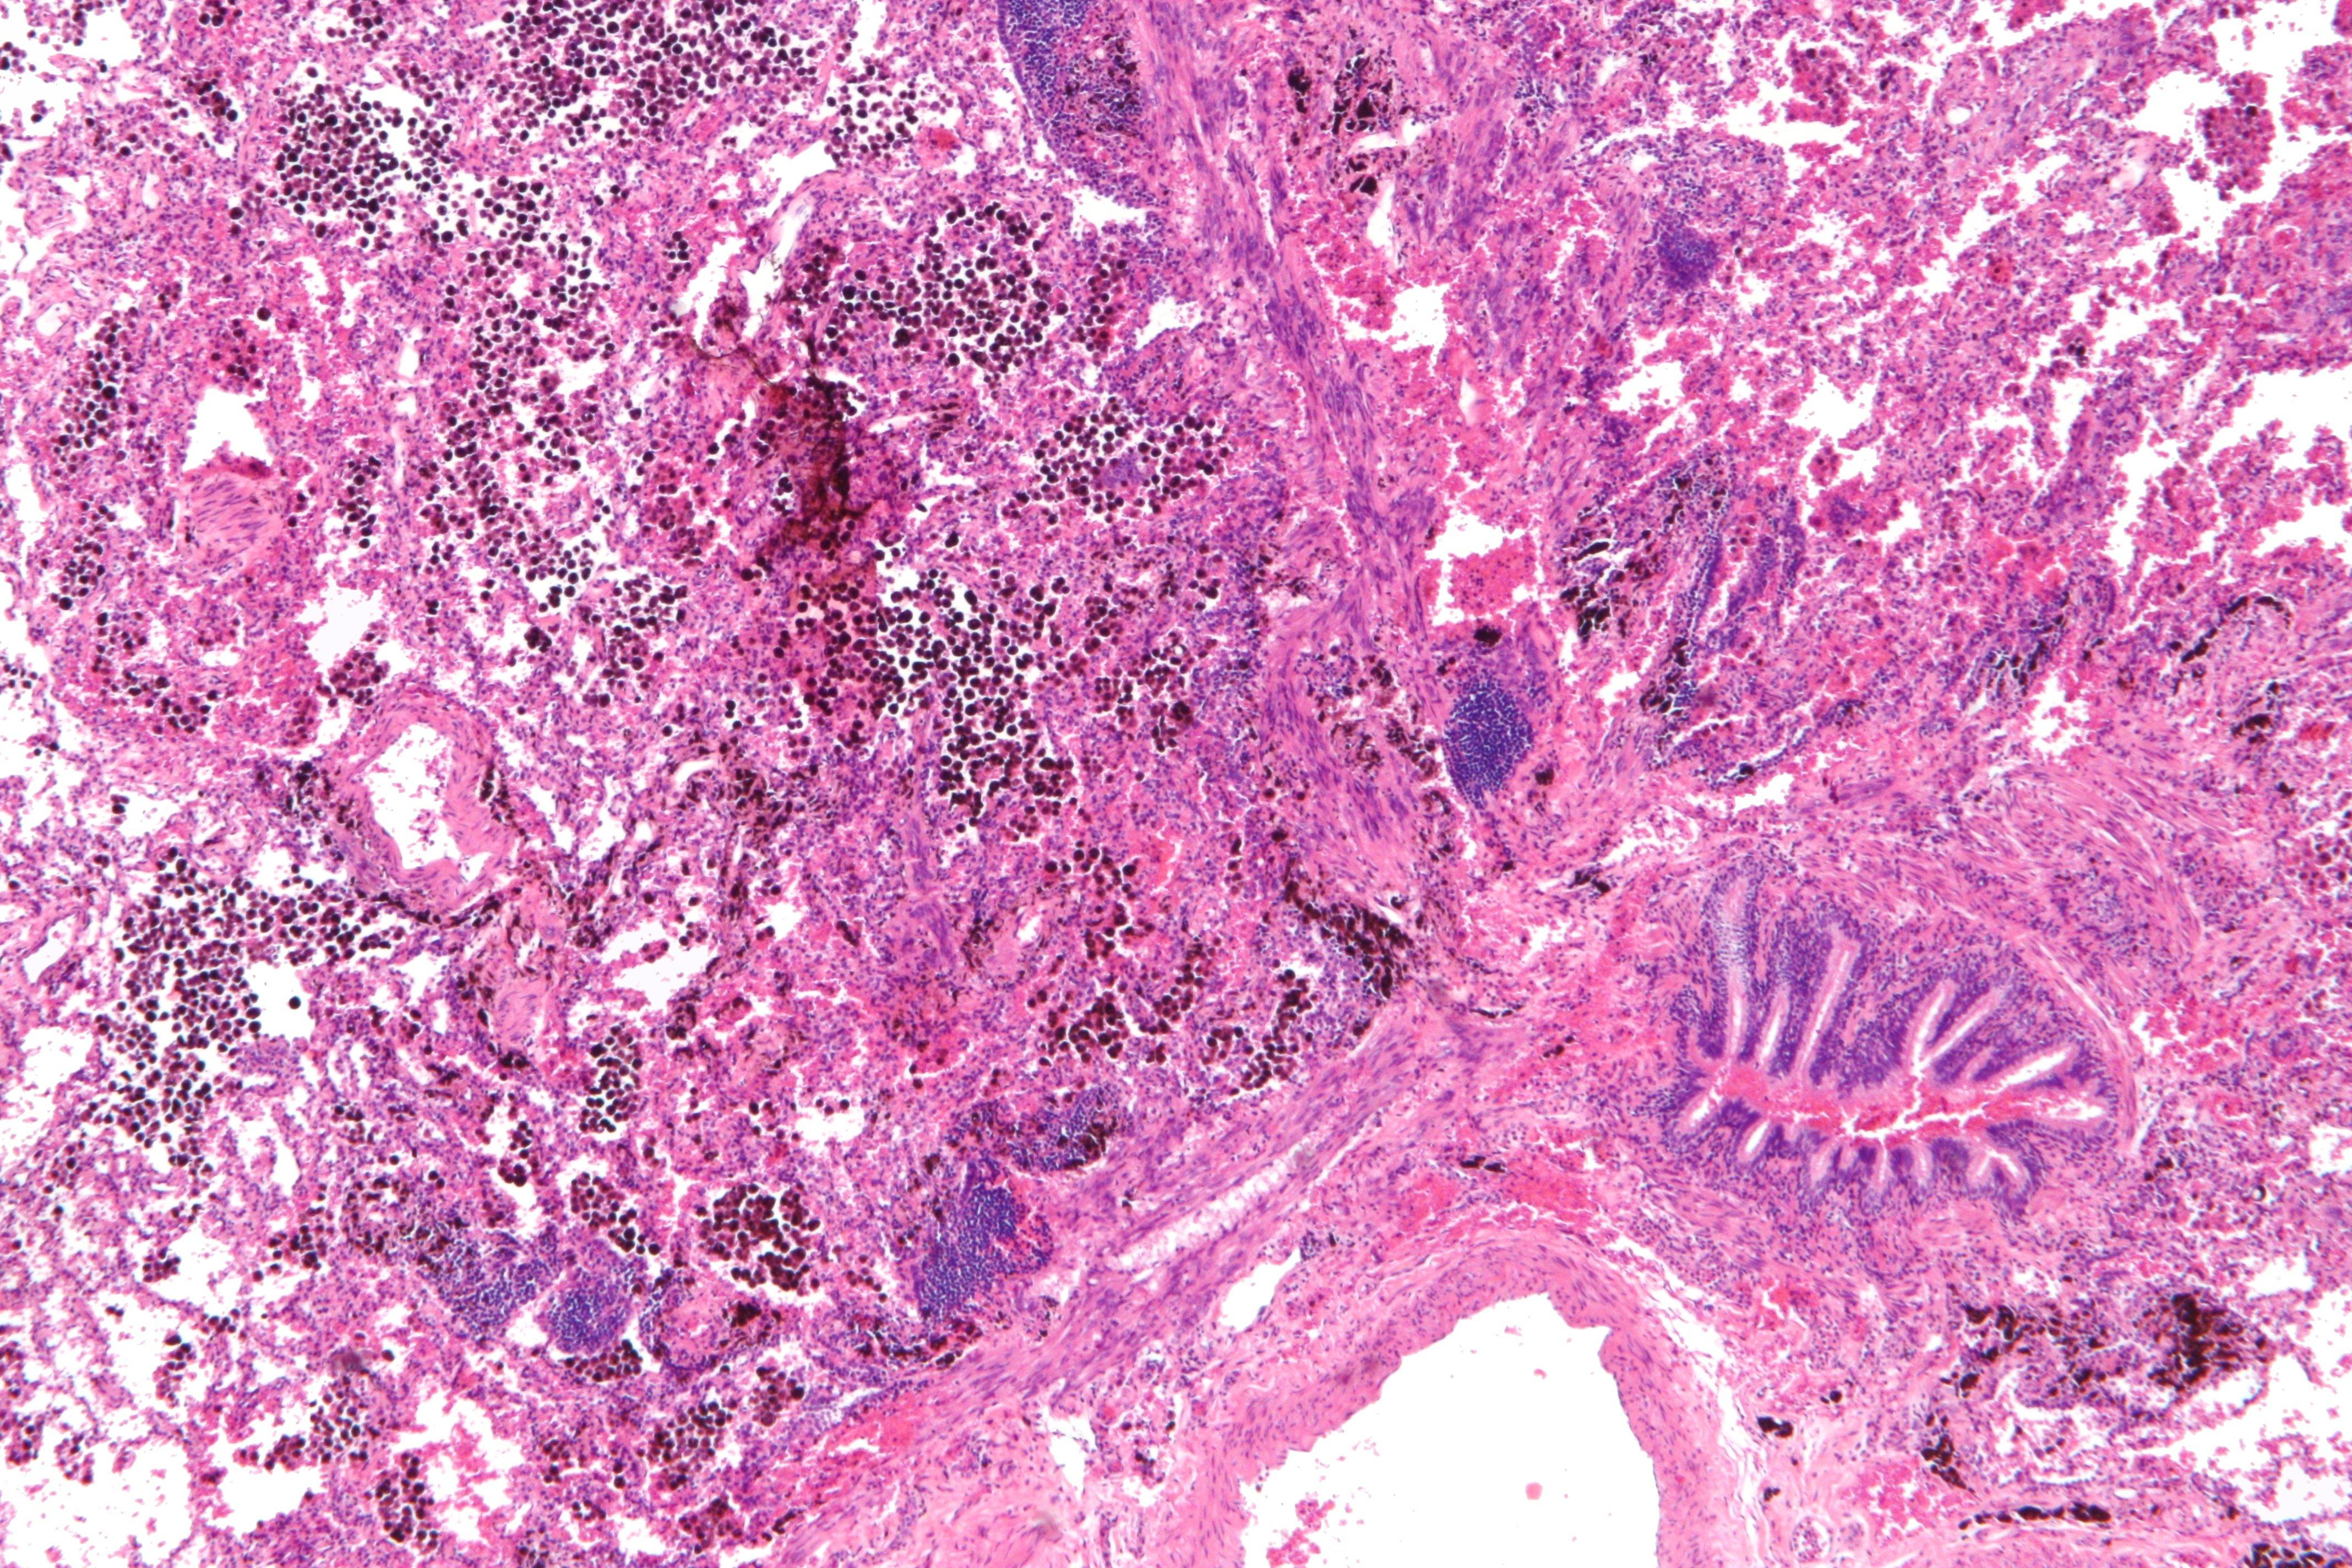 Pulmonary hemorrhage